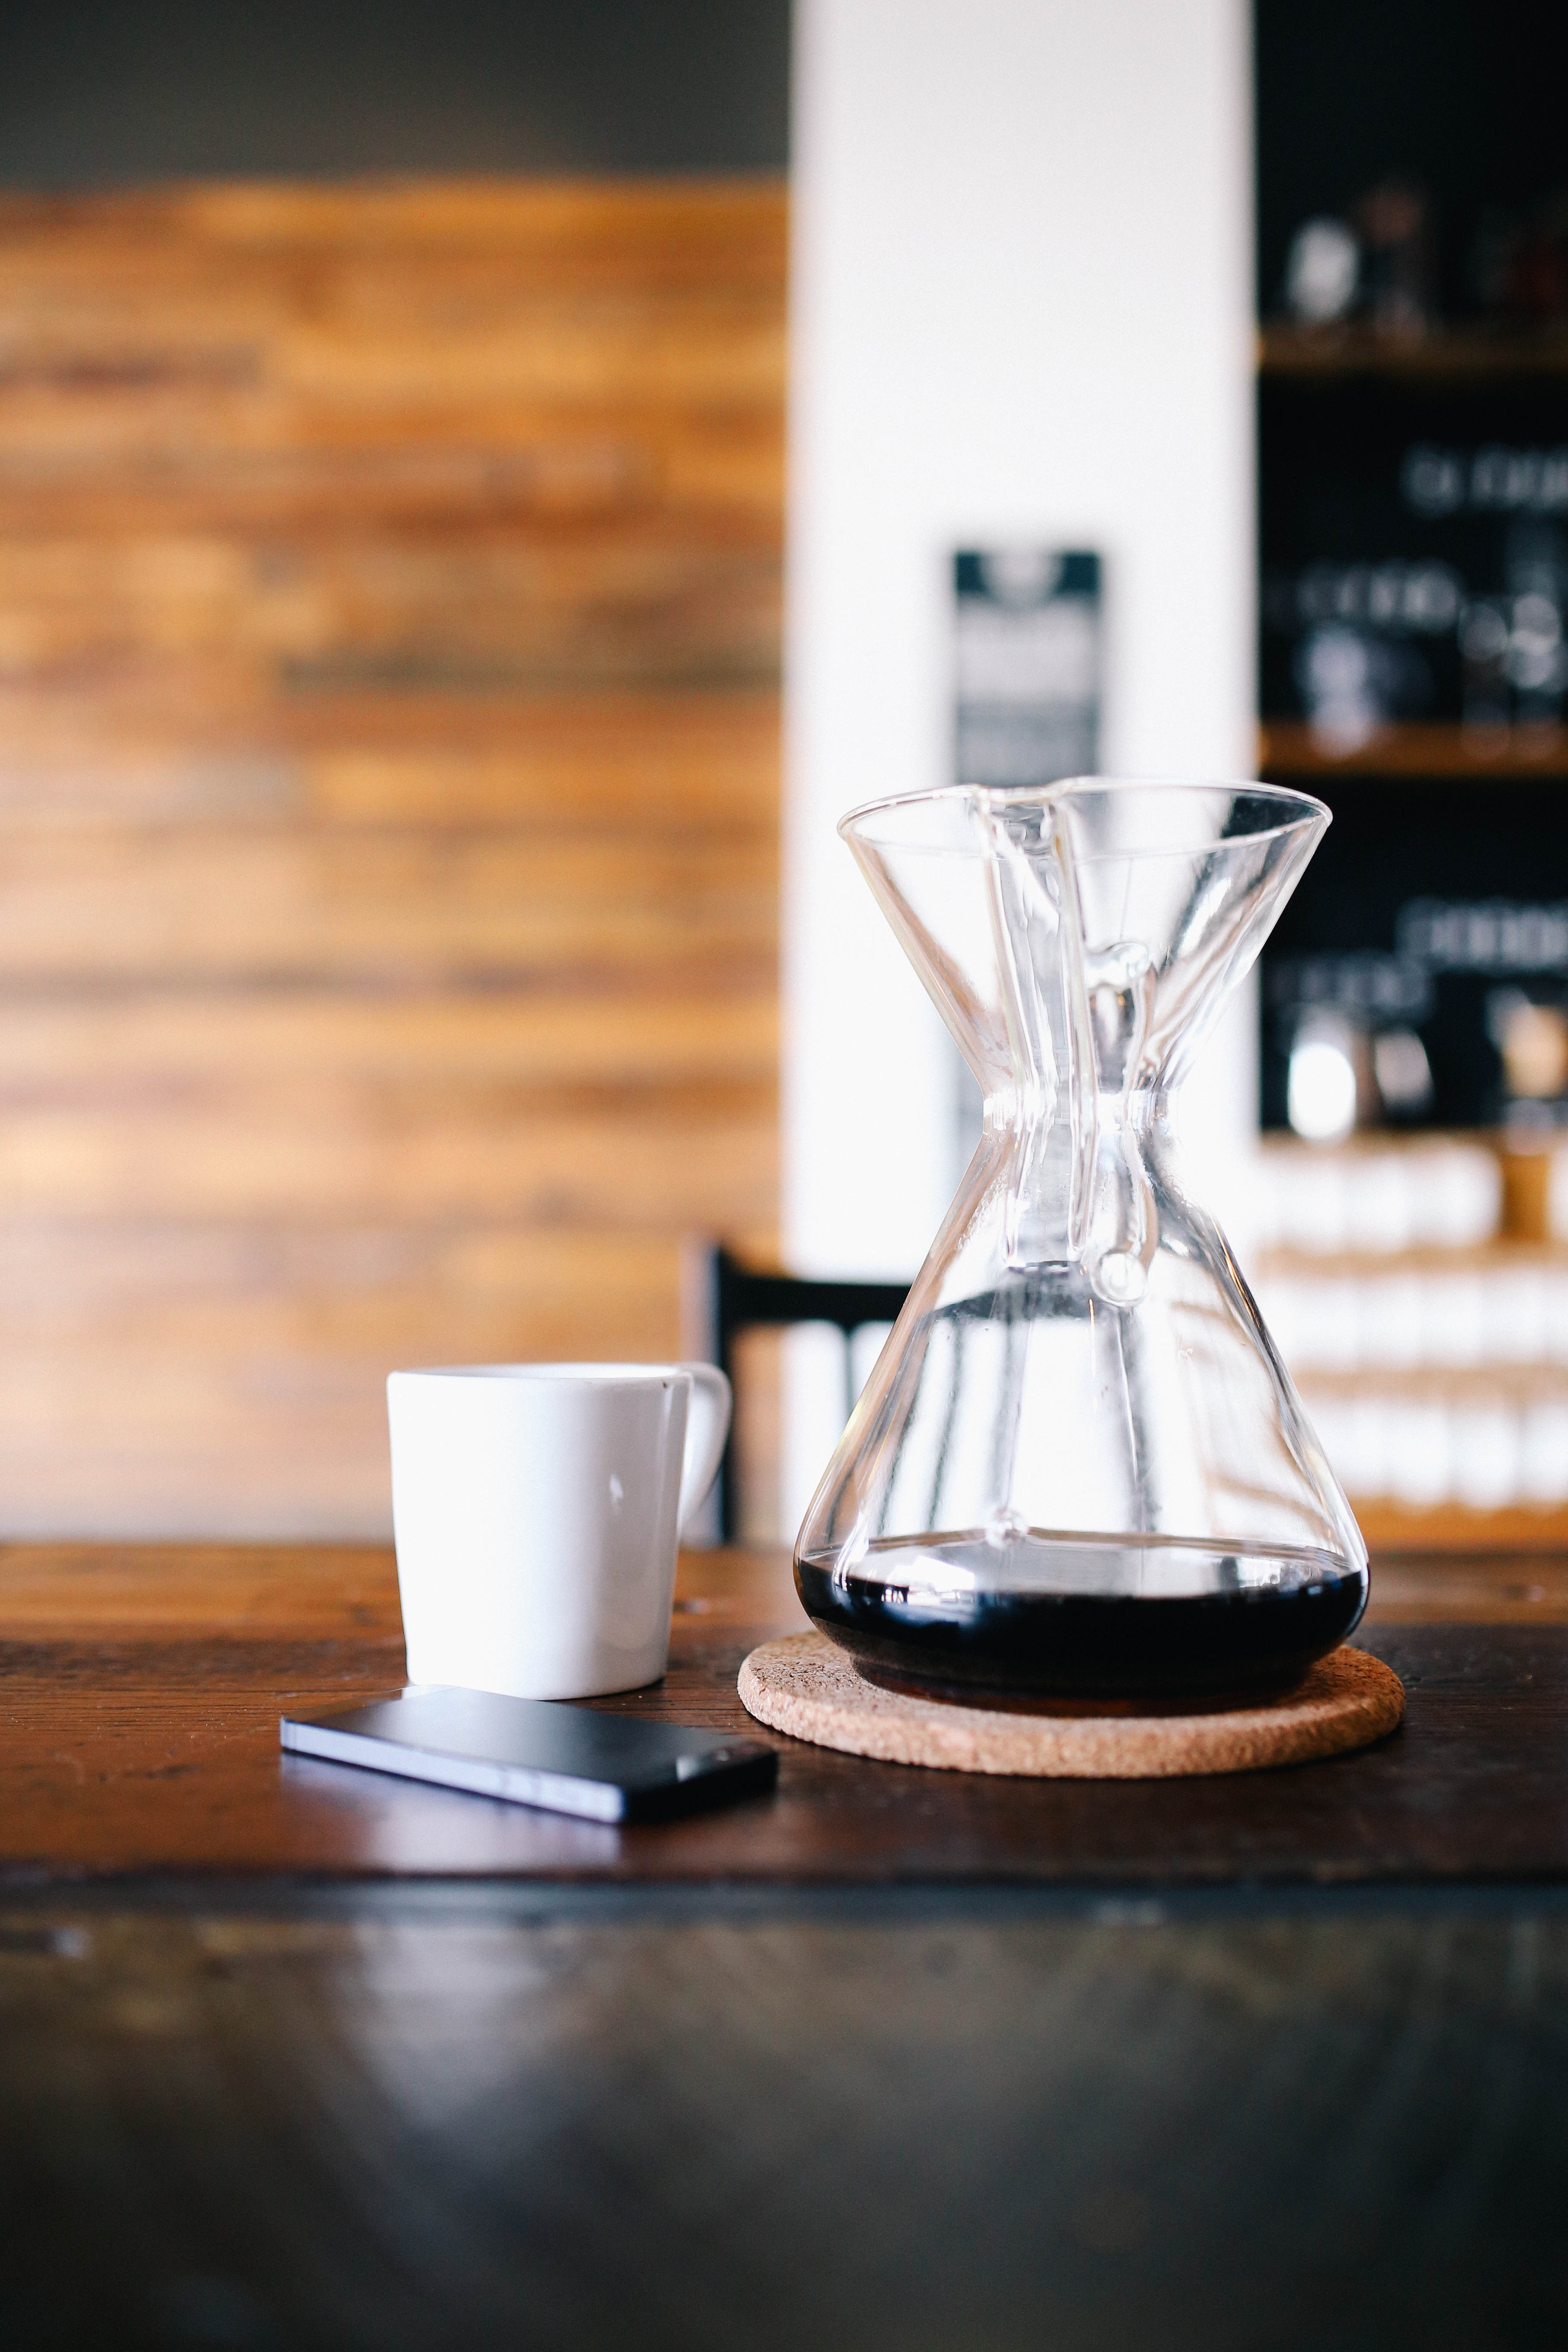 Kohvi kann ja tass laual